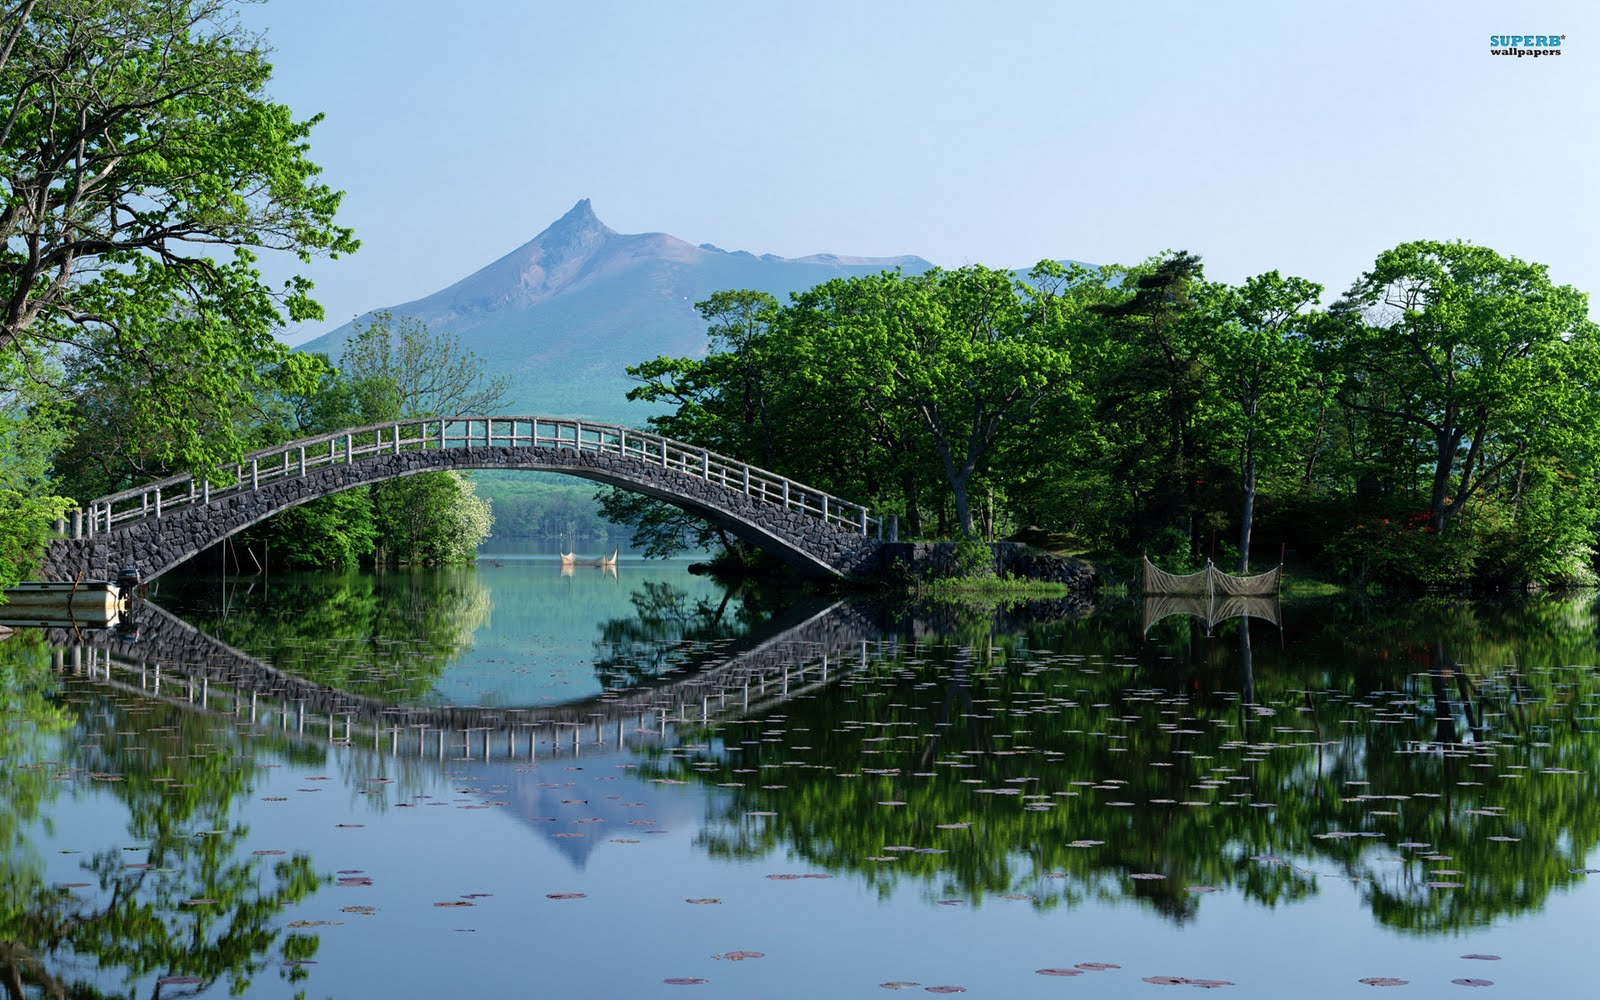 http://3.bp.blogspot.com/-qpiyQ-xF2hs/TcwV5tTC-ZI/AAAAAAAANPw/oTF21xHE1-o/s1600/onuma-quasi-national-park-3272-1920x1200.jpg